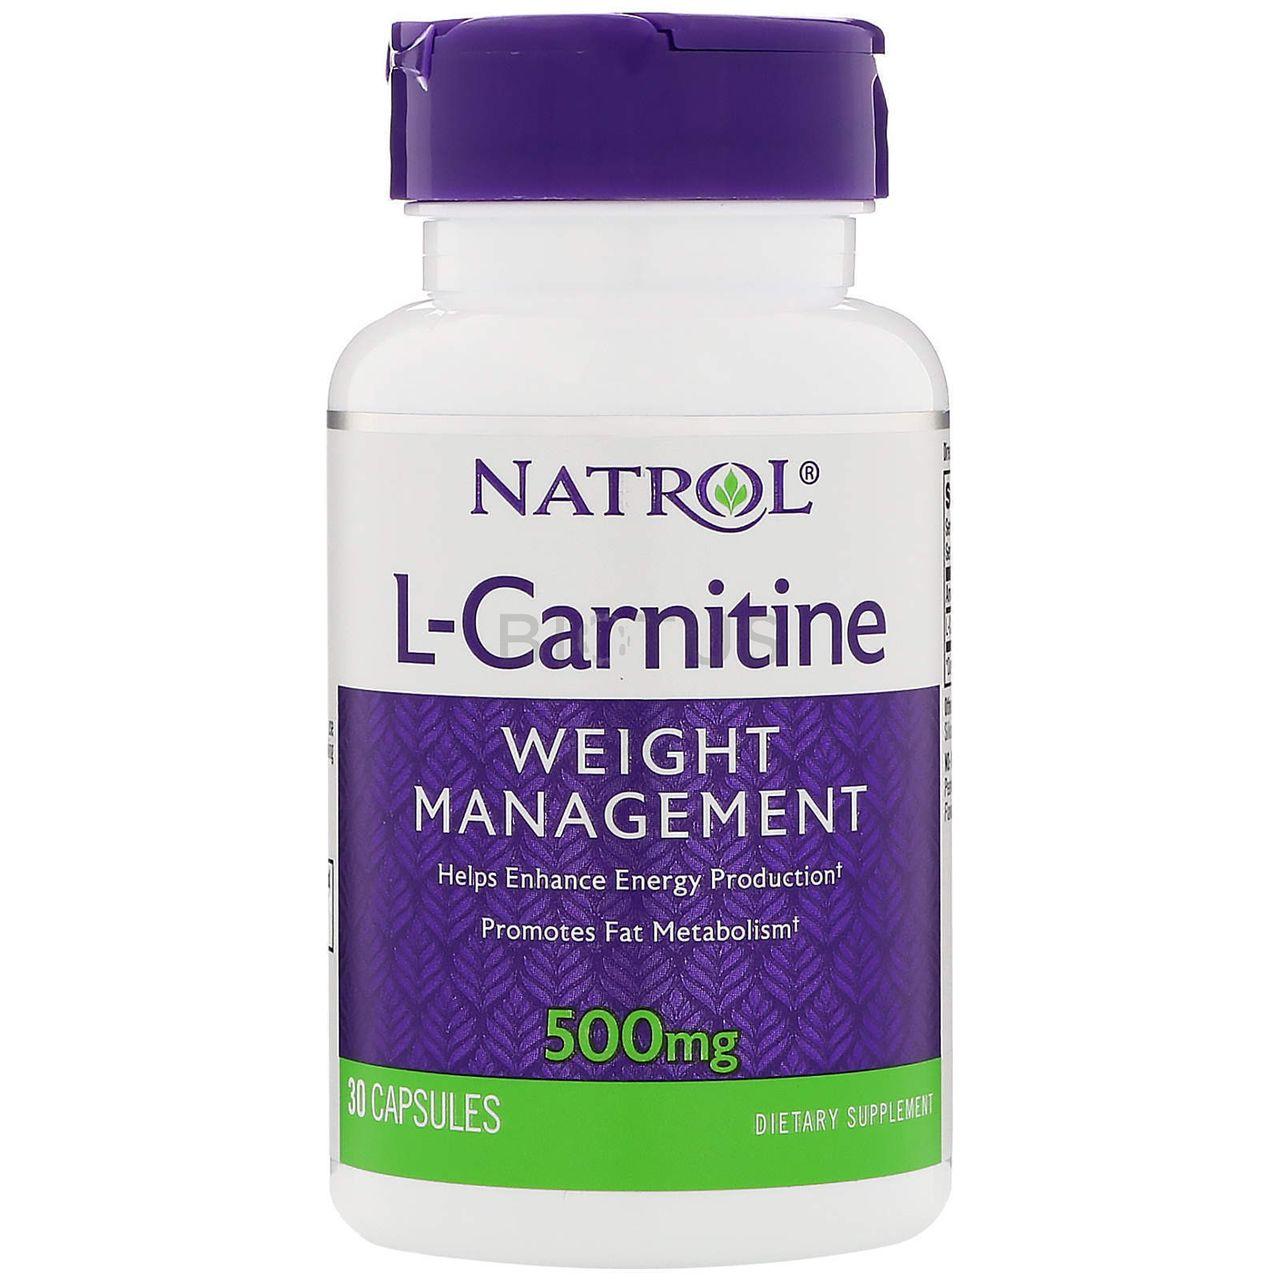 Купить NATROL Добавка биологически активная к пище Натрол L-Карнитин / L-Carnitine 500 мг 30 капсул